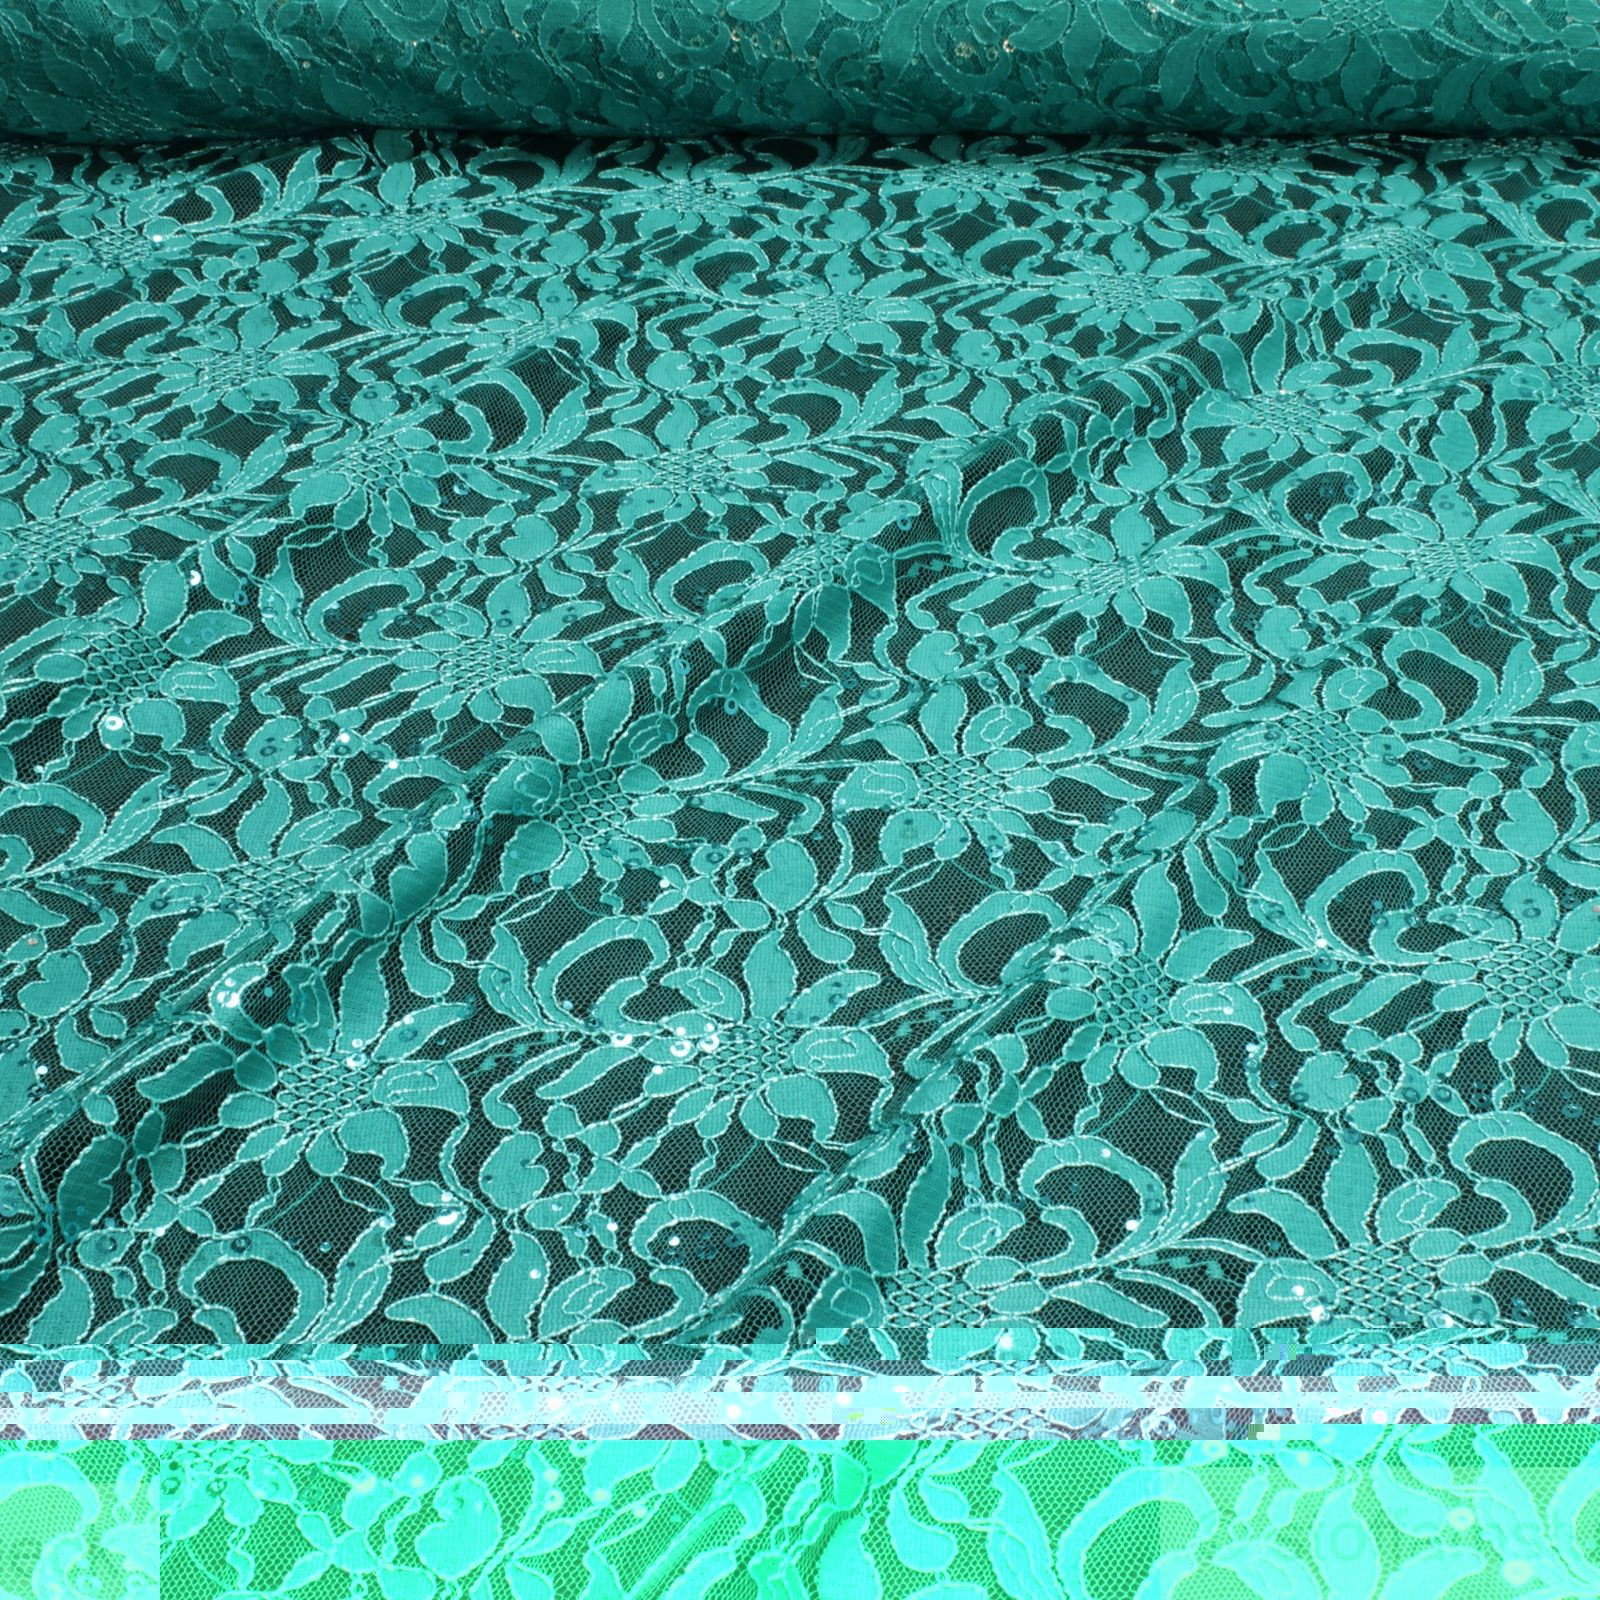 Polyamid Polyester Elastan Spitze Petrol Blume